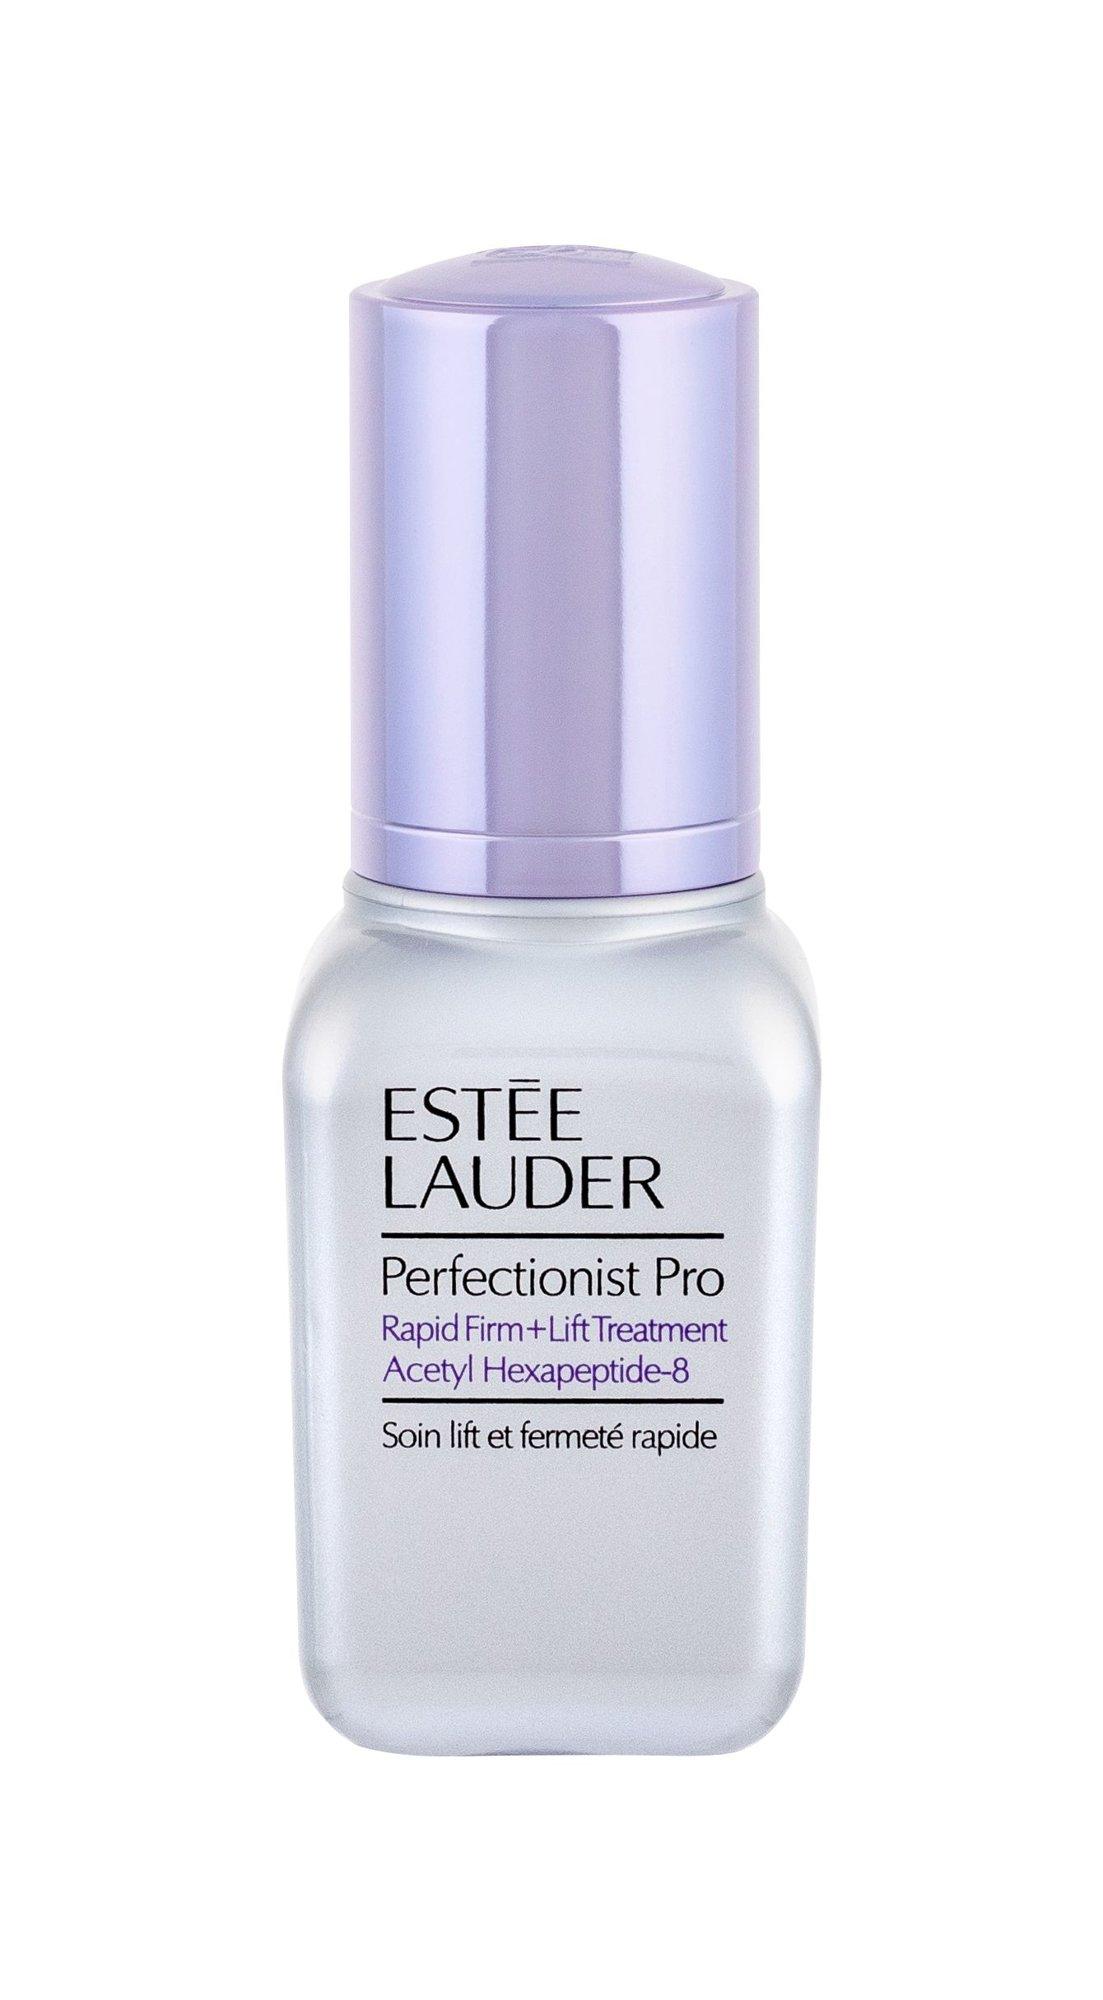 Estée Lauder Perfectionist Skin Serum 30ml